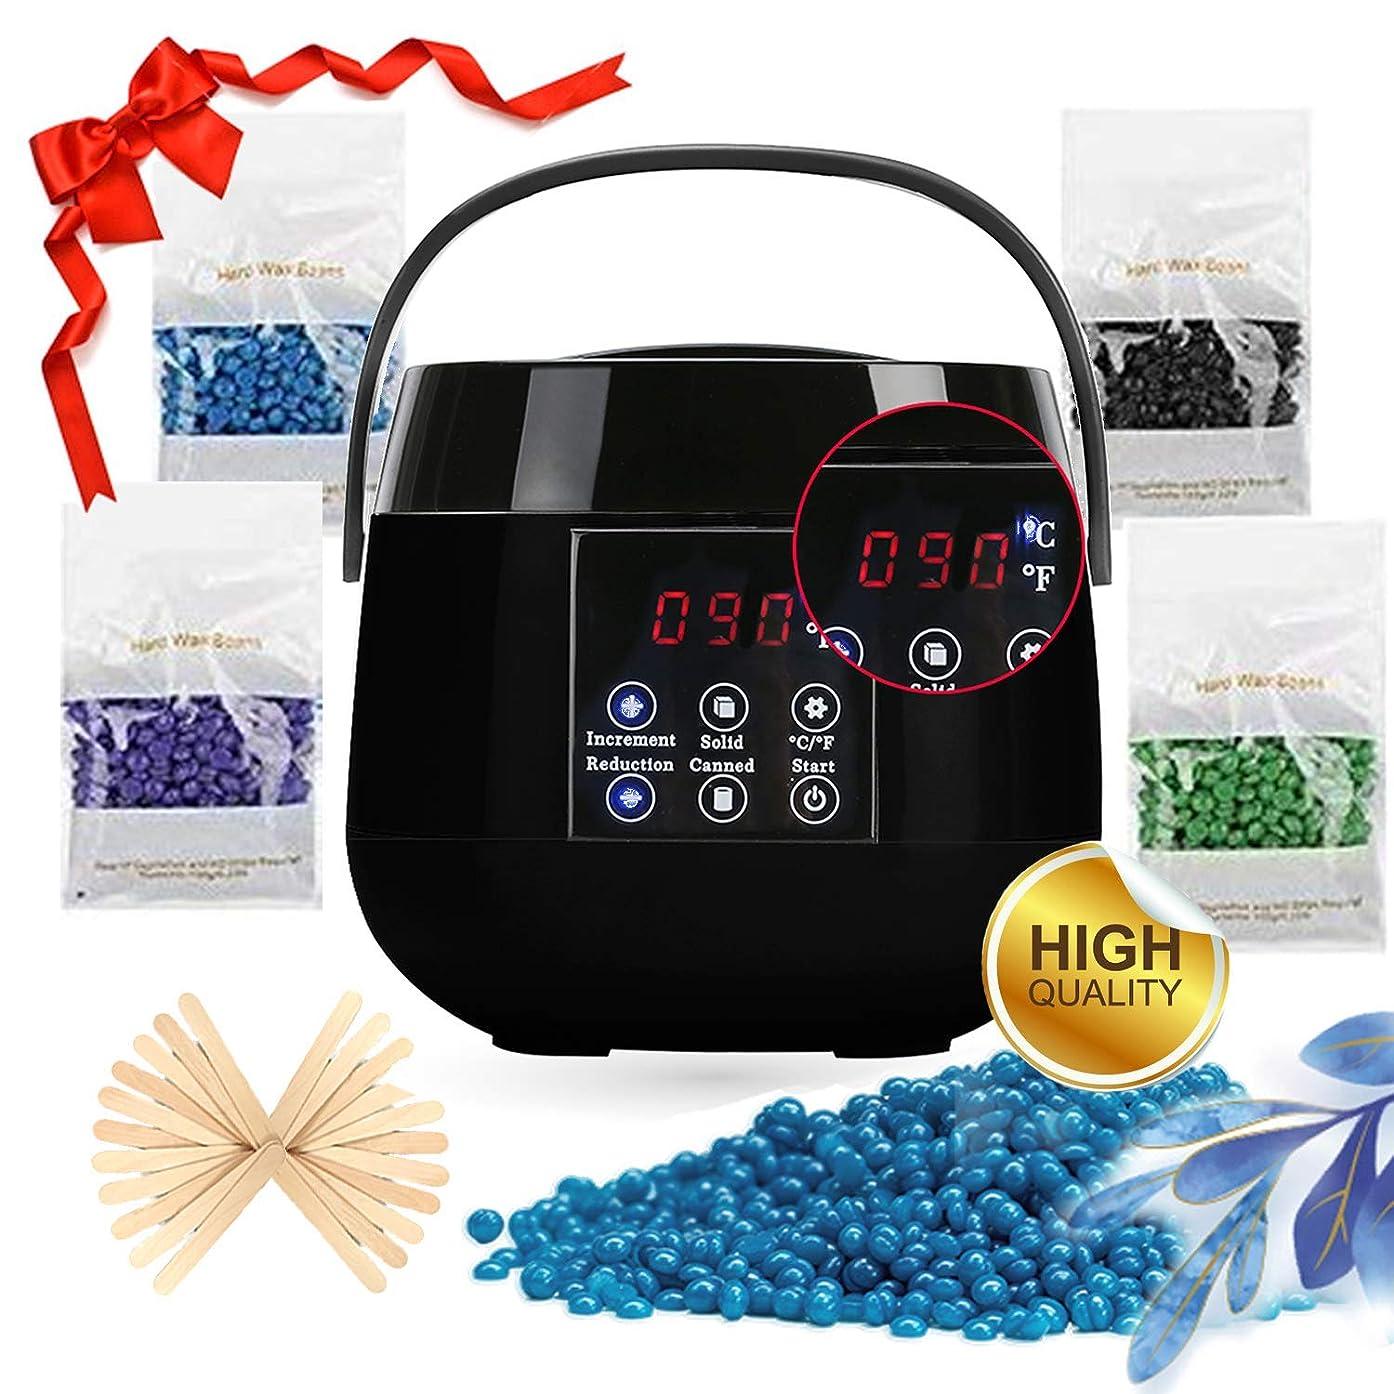 Wax Warmer Kit, Digital Screen Wax Warmer Hair Removal with 20 Wax Applicator Sticks and 4 Flavor Hard Wax Beans for Arm, Leg,Toe and Bikini Area